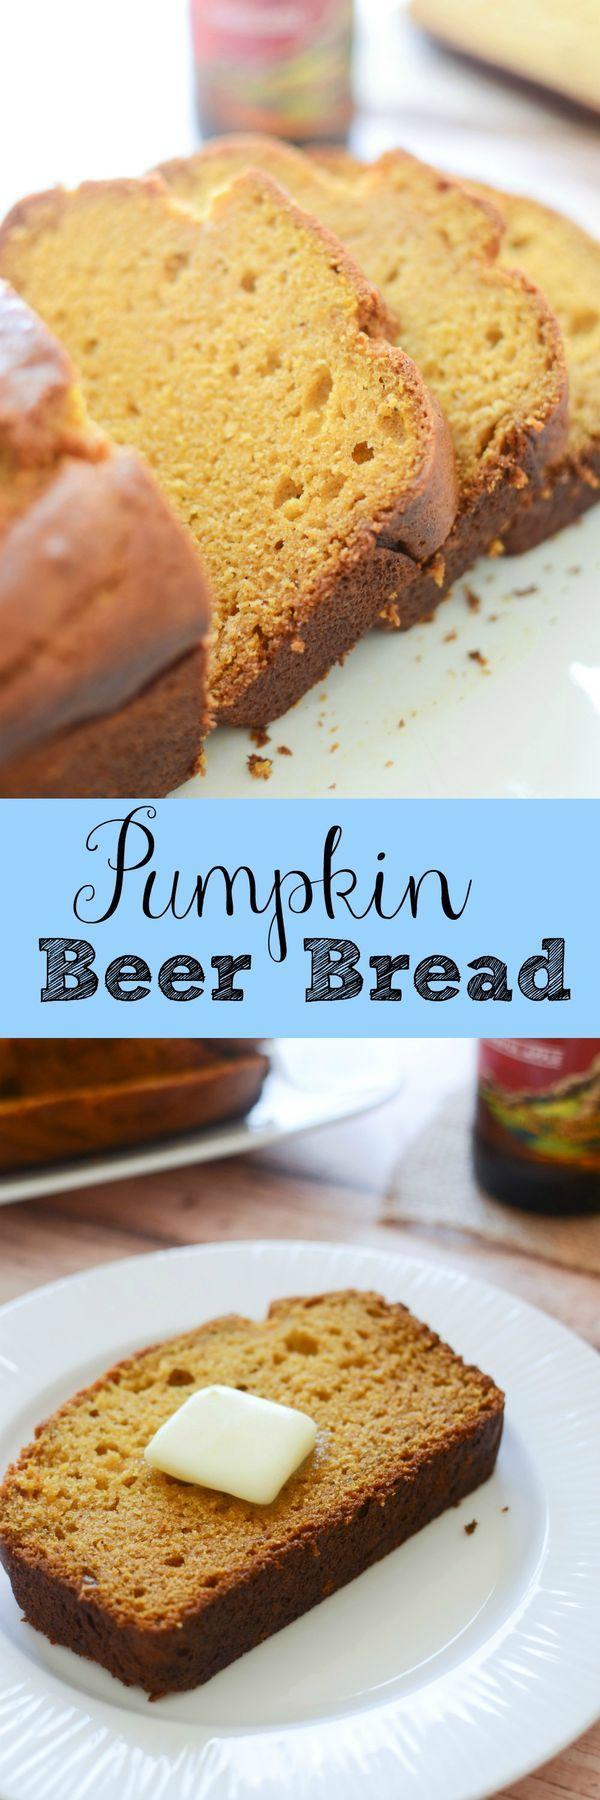 Pumpkin Beer Bread - the BEST pumpkin bread recipe! Serve this for Thanksgiving!